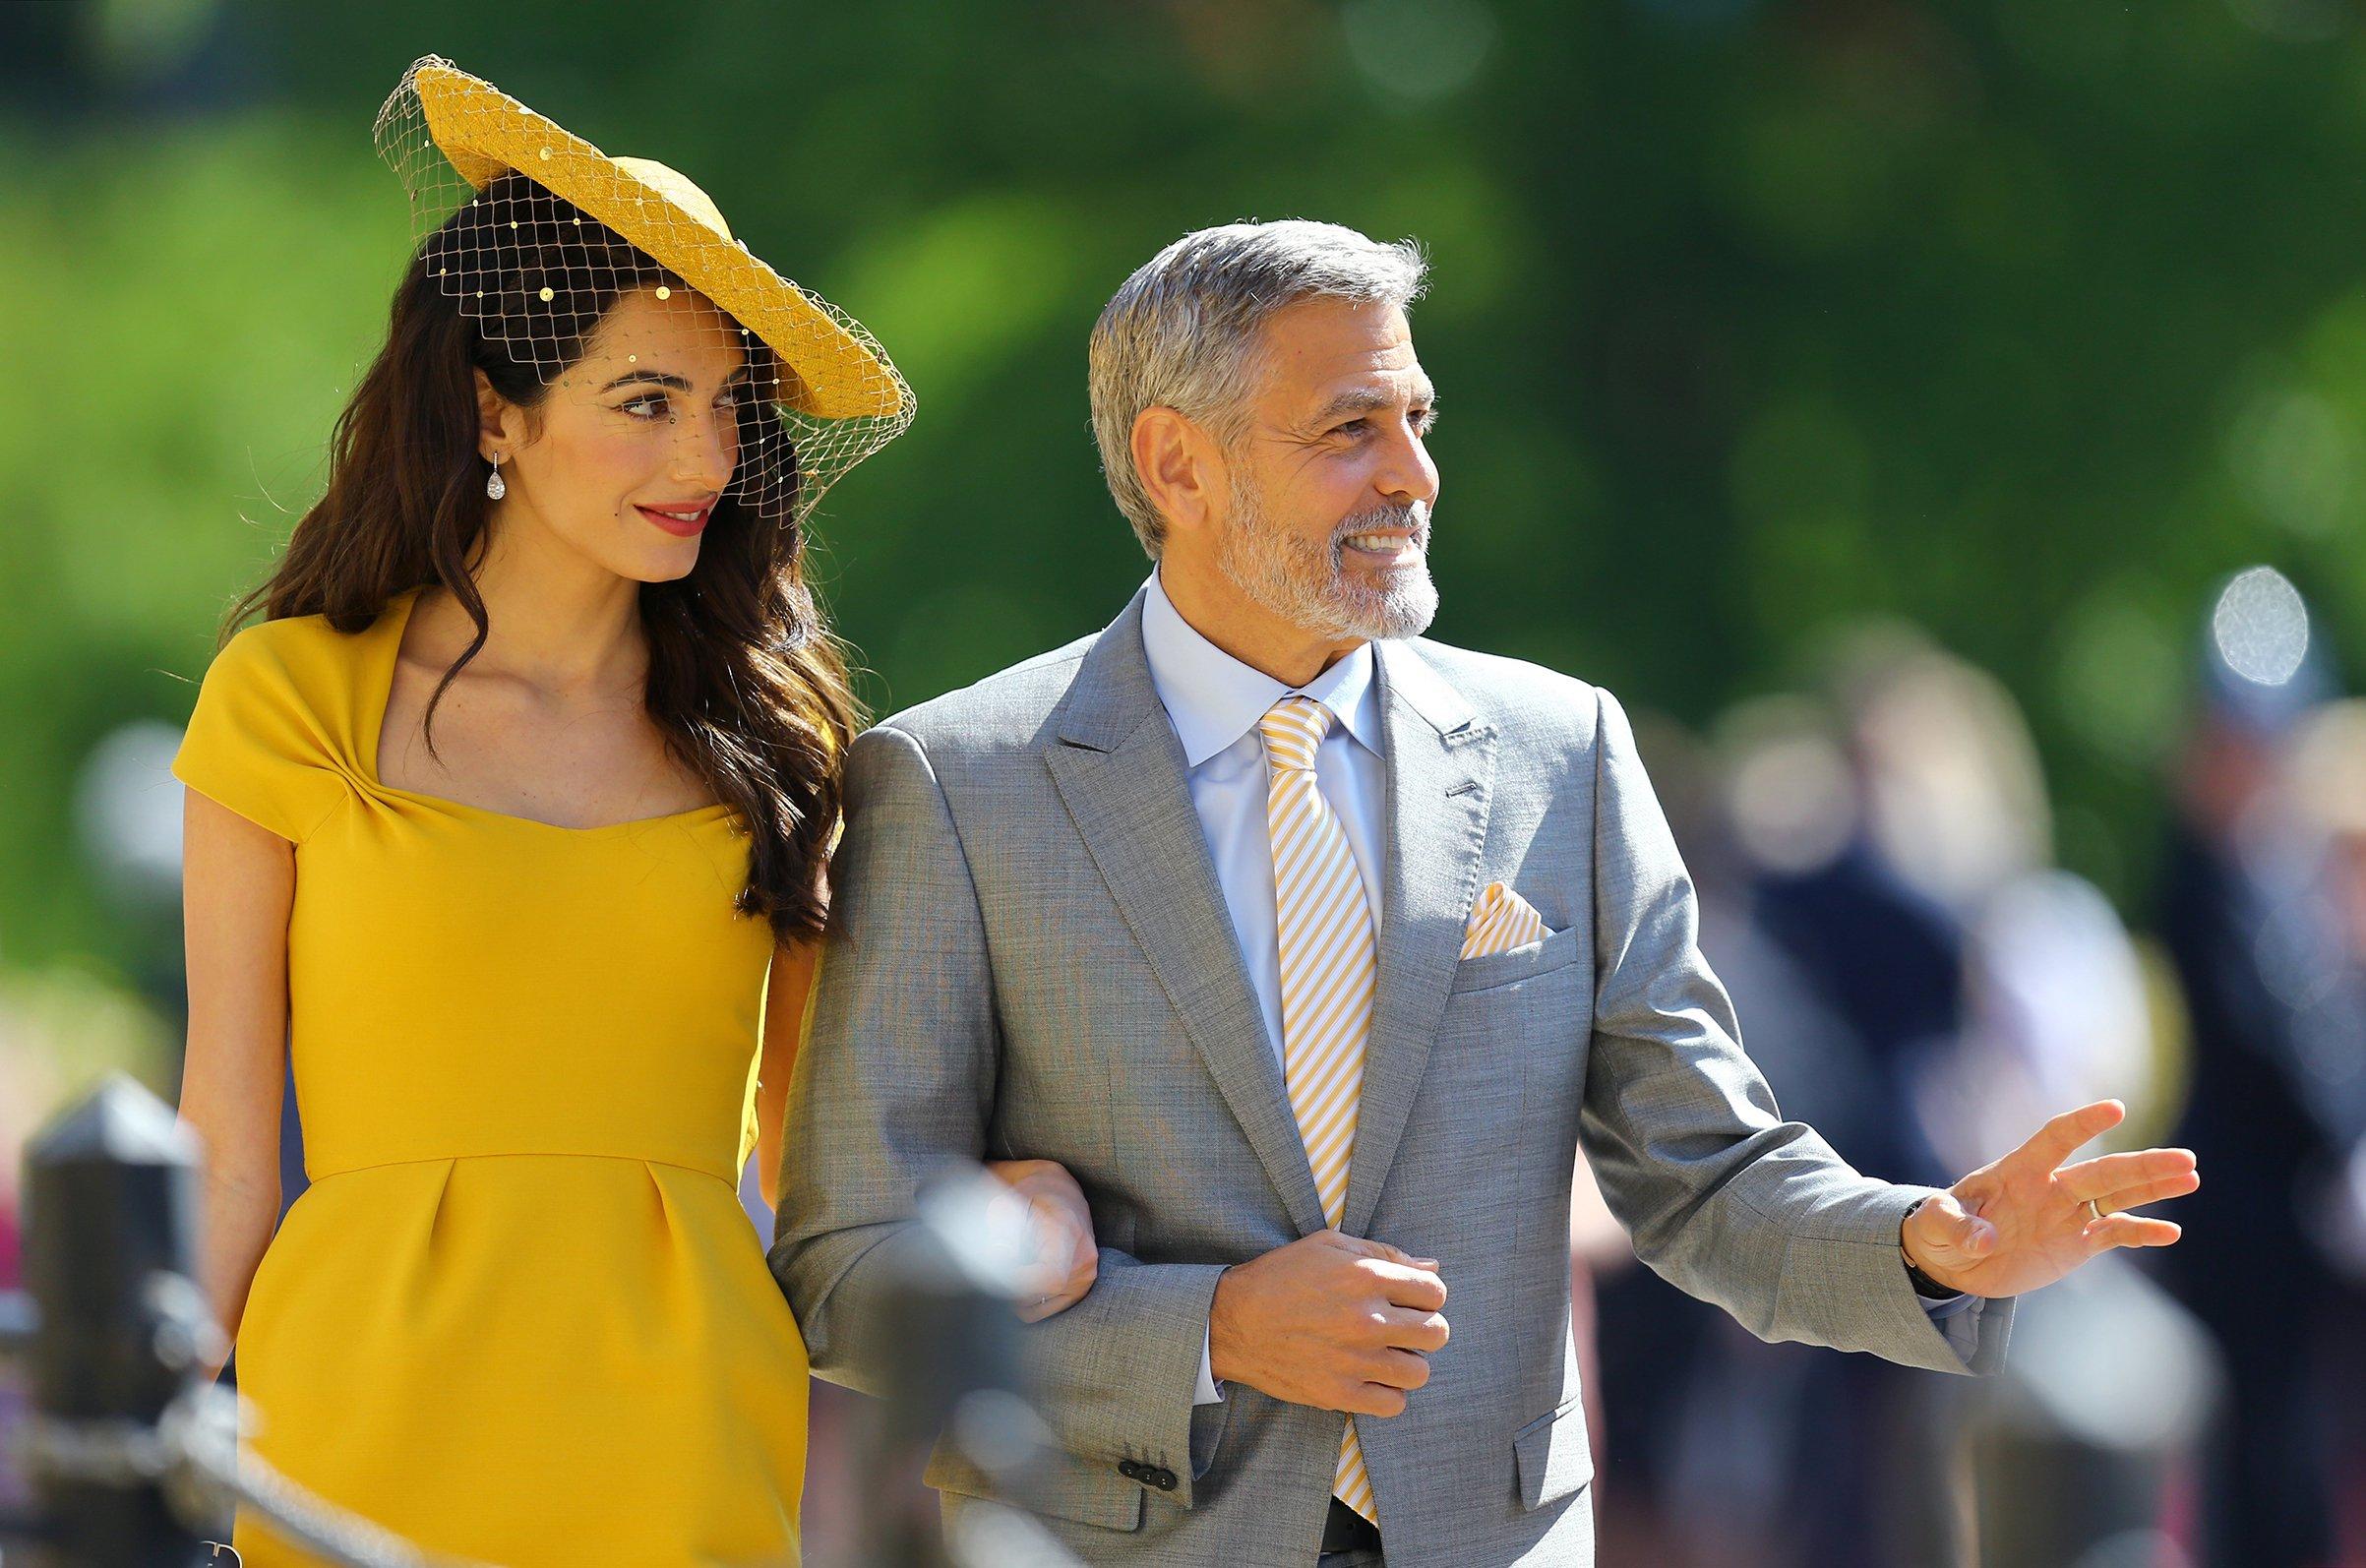 George and Amal at the roayal wedding